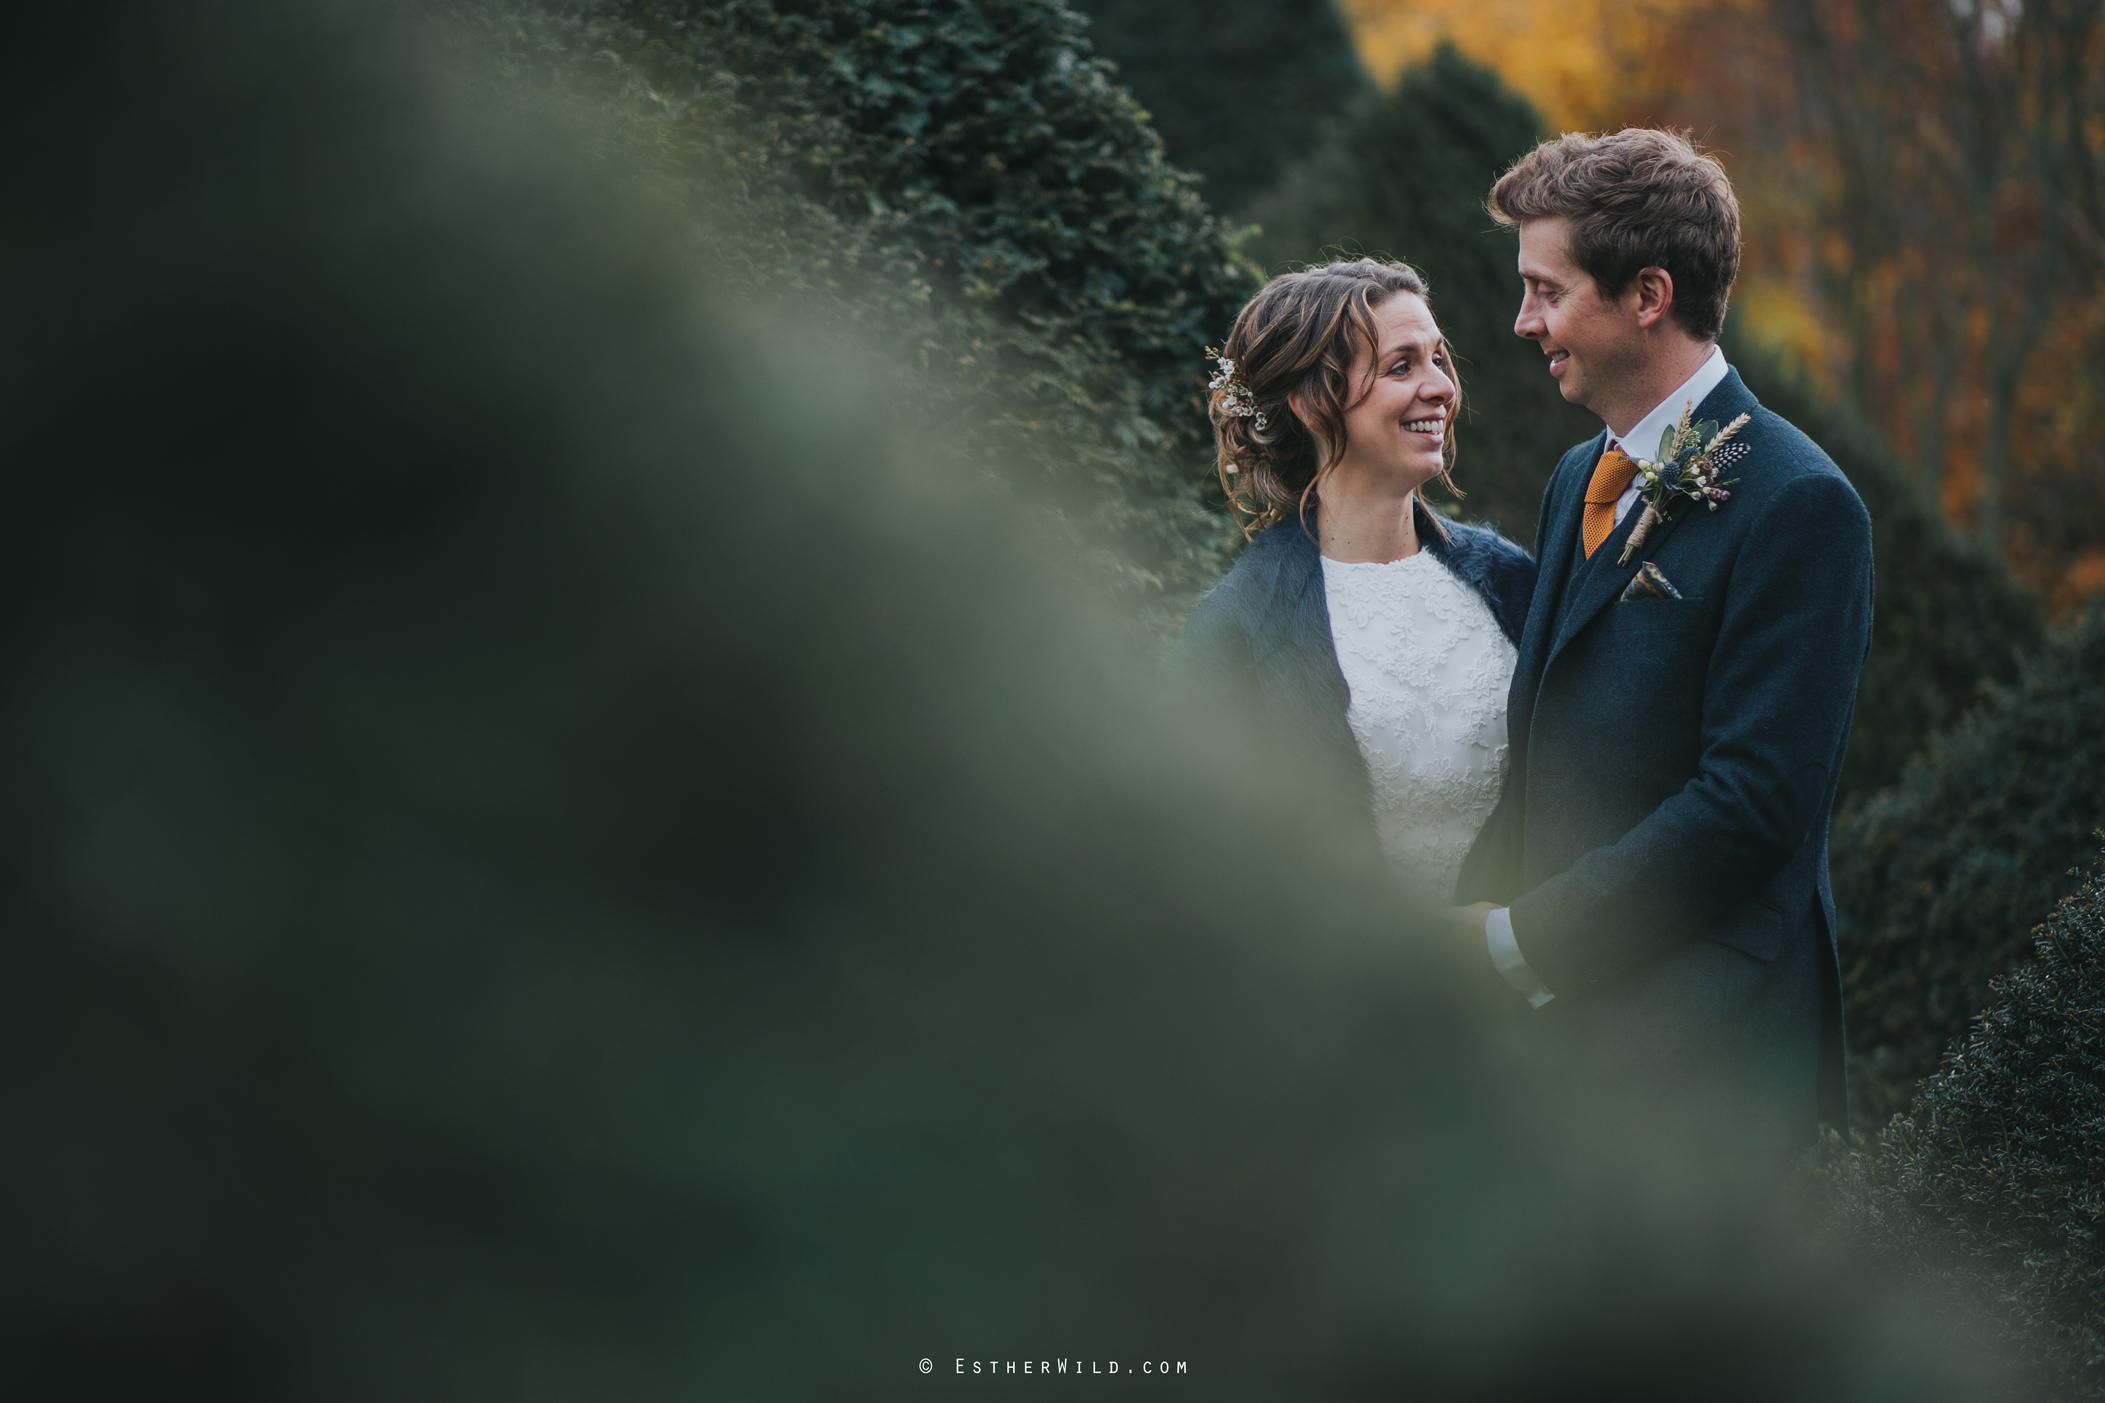 1117_Chaucer_Barn_Wedding_Photography_Esther_Wild_Norfolk_Photographer_Z72A0536.jpg